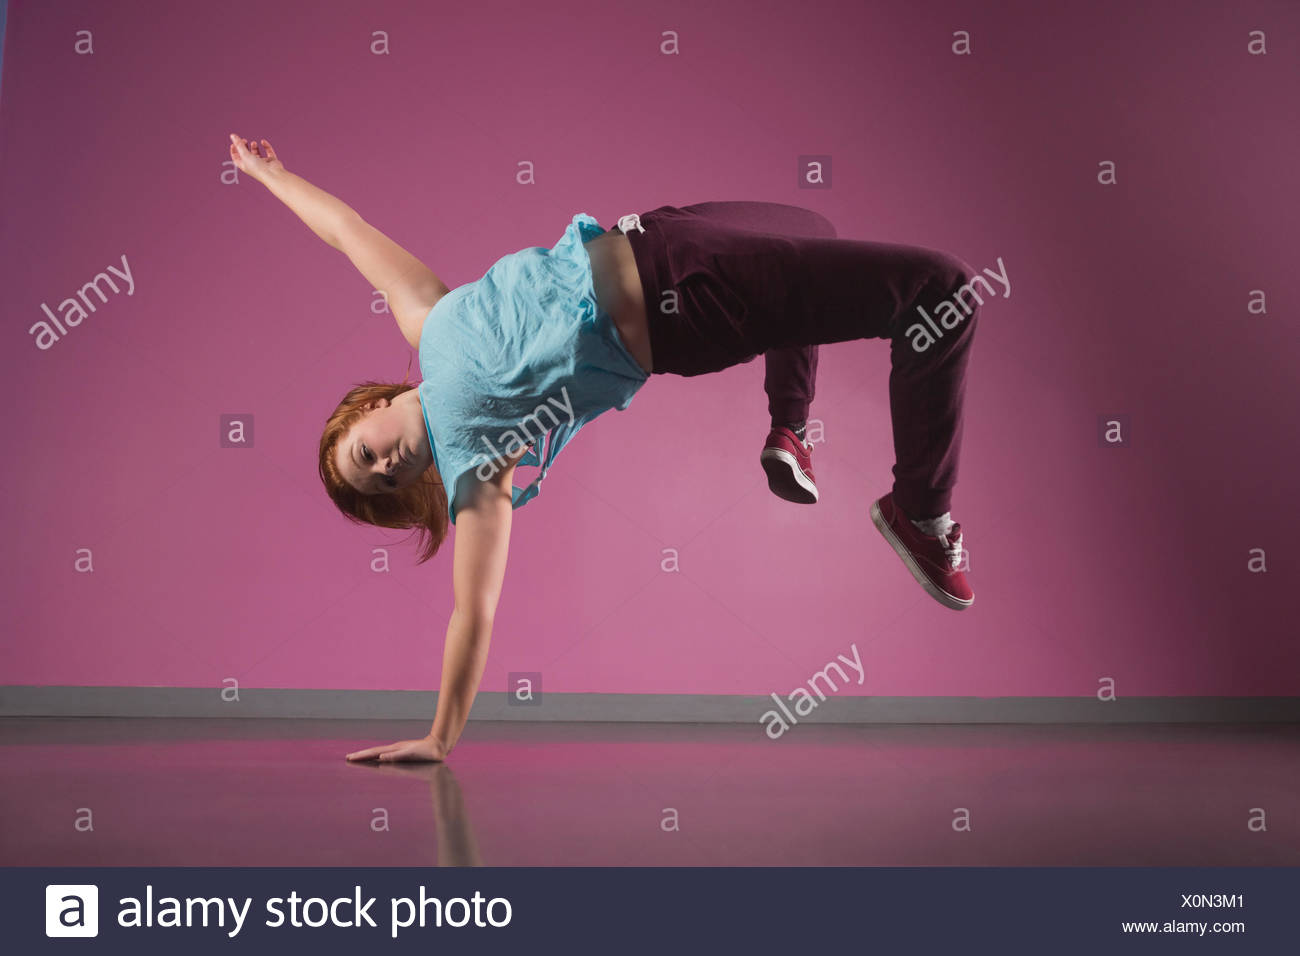 Pretty break dancer doing a handstand - Stock Image